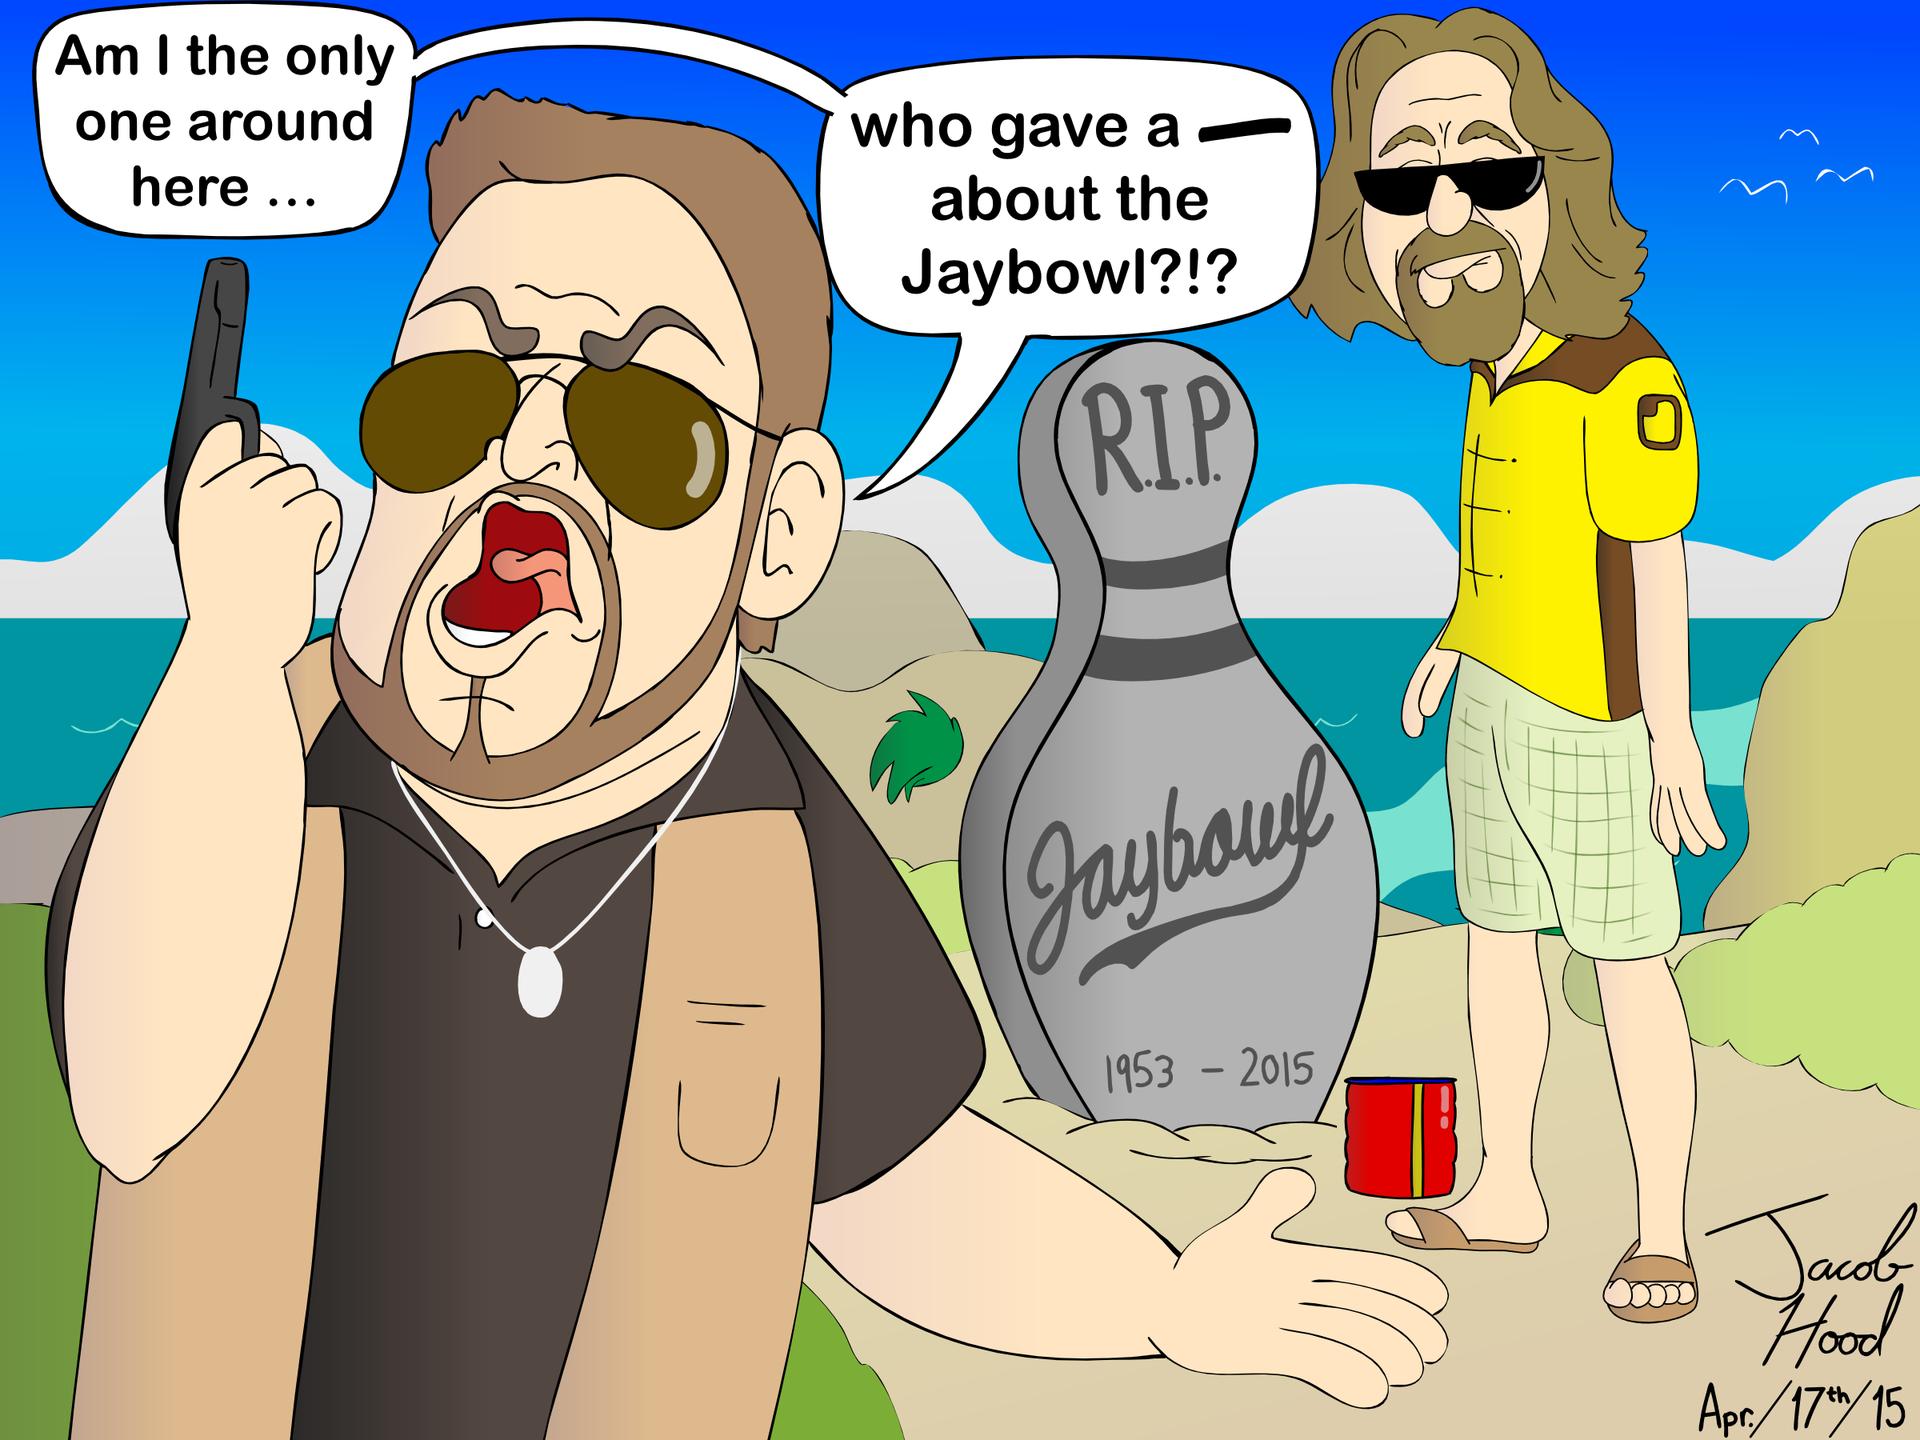 Jaybowl